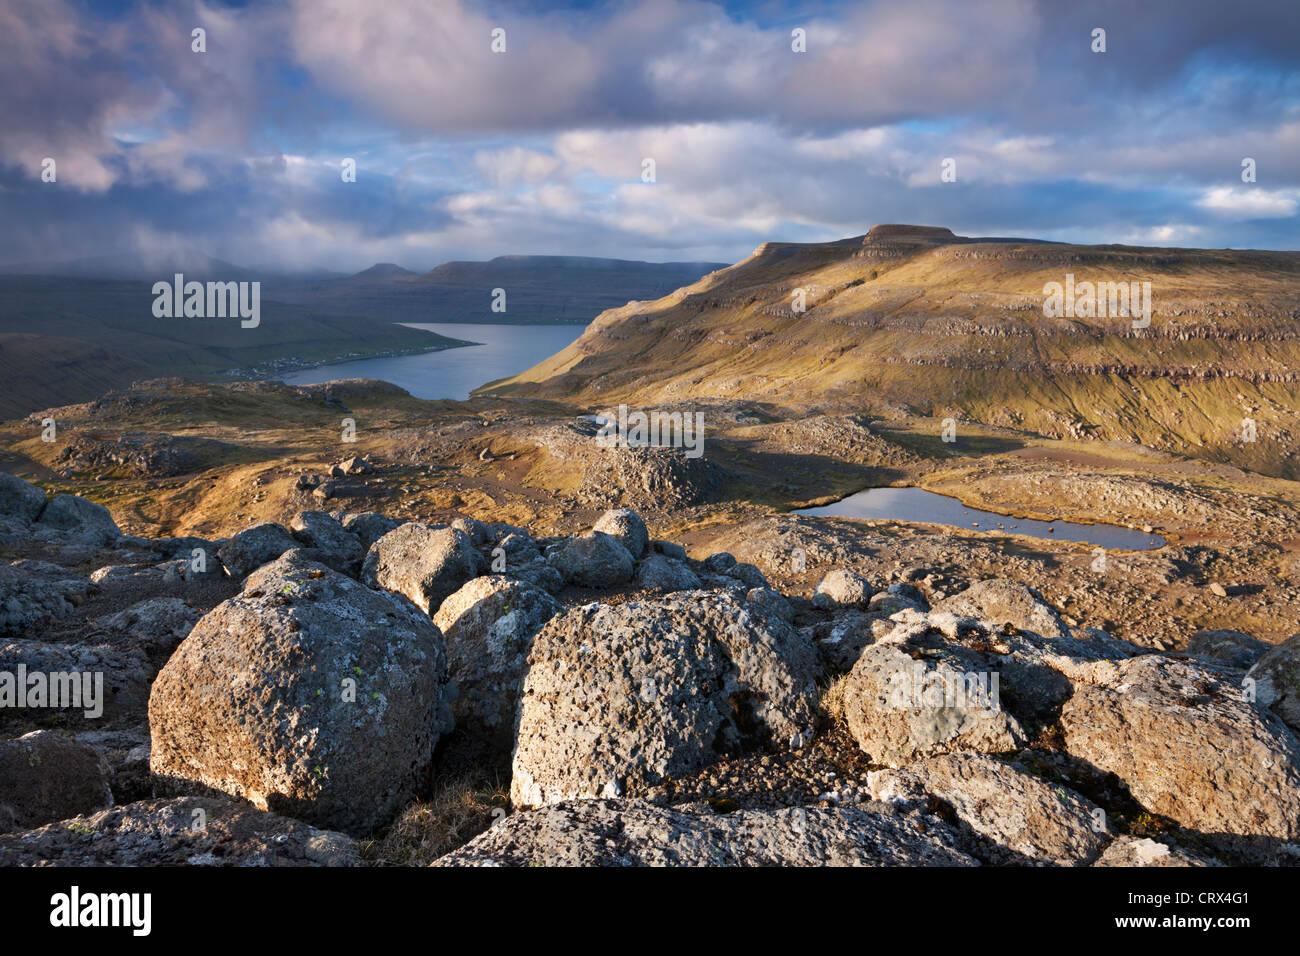 Mountain scenery on the island of Streymoy, Faroe Islands. Spring (June) 2012. - Stock Image